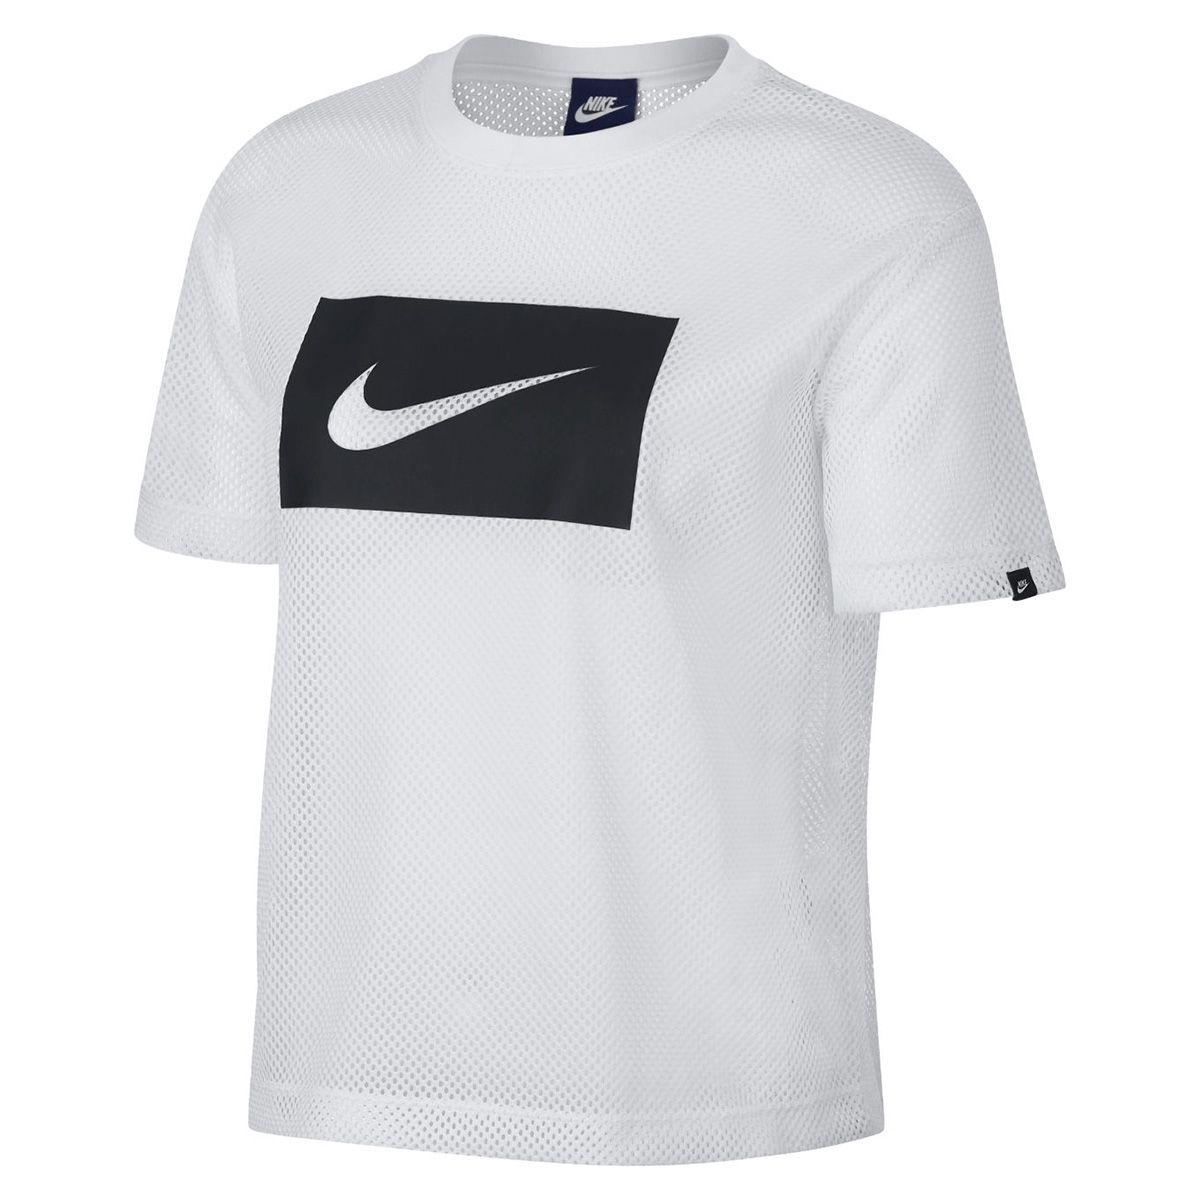 65172dc556db5 Type Shirts Nike Wmns NSW Top Swoosh Mesh Crop Top